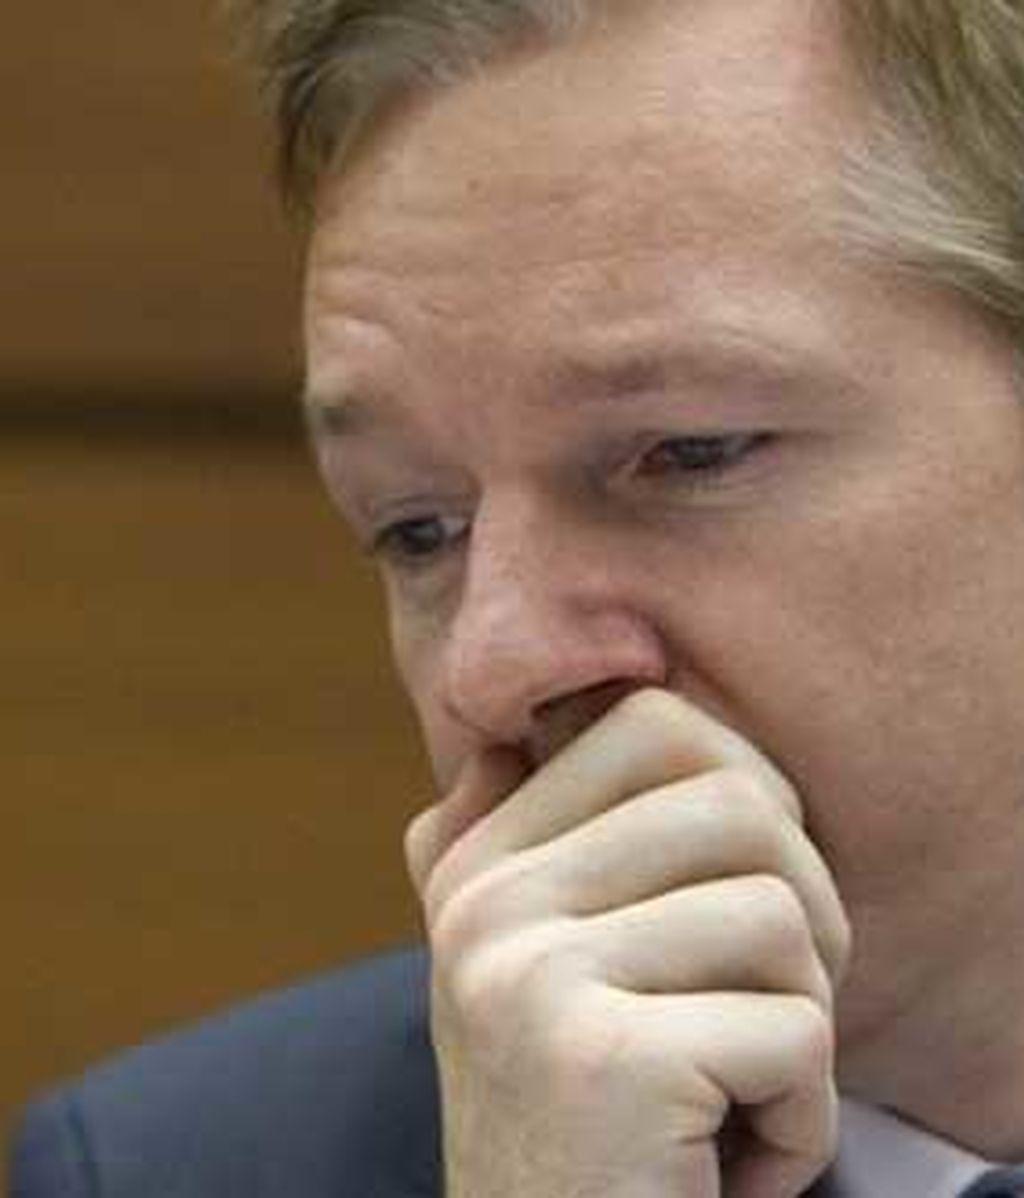 Julian Assange, en una imagen de archivo. Foto: AP